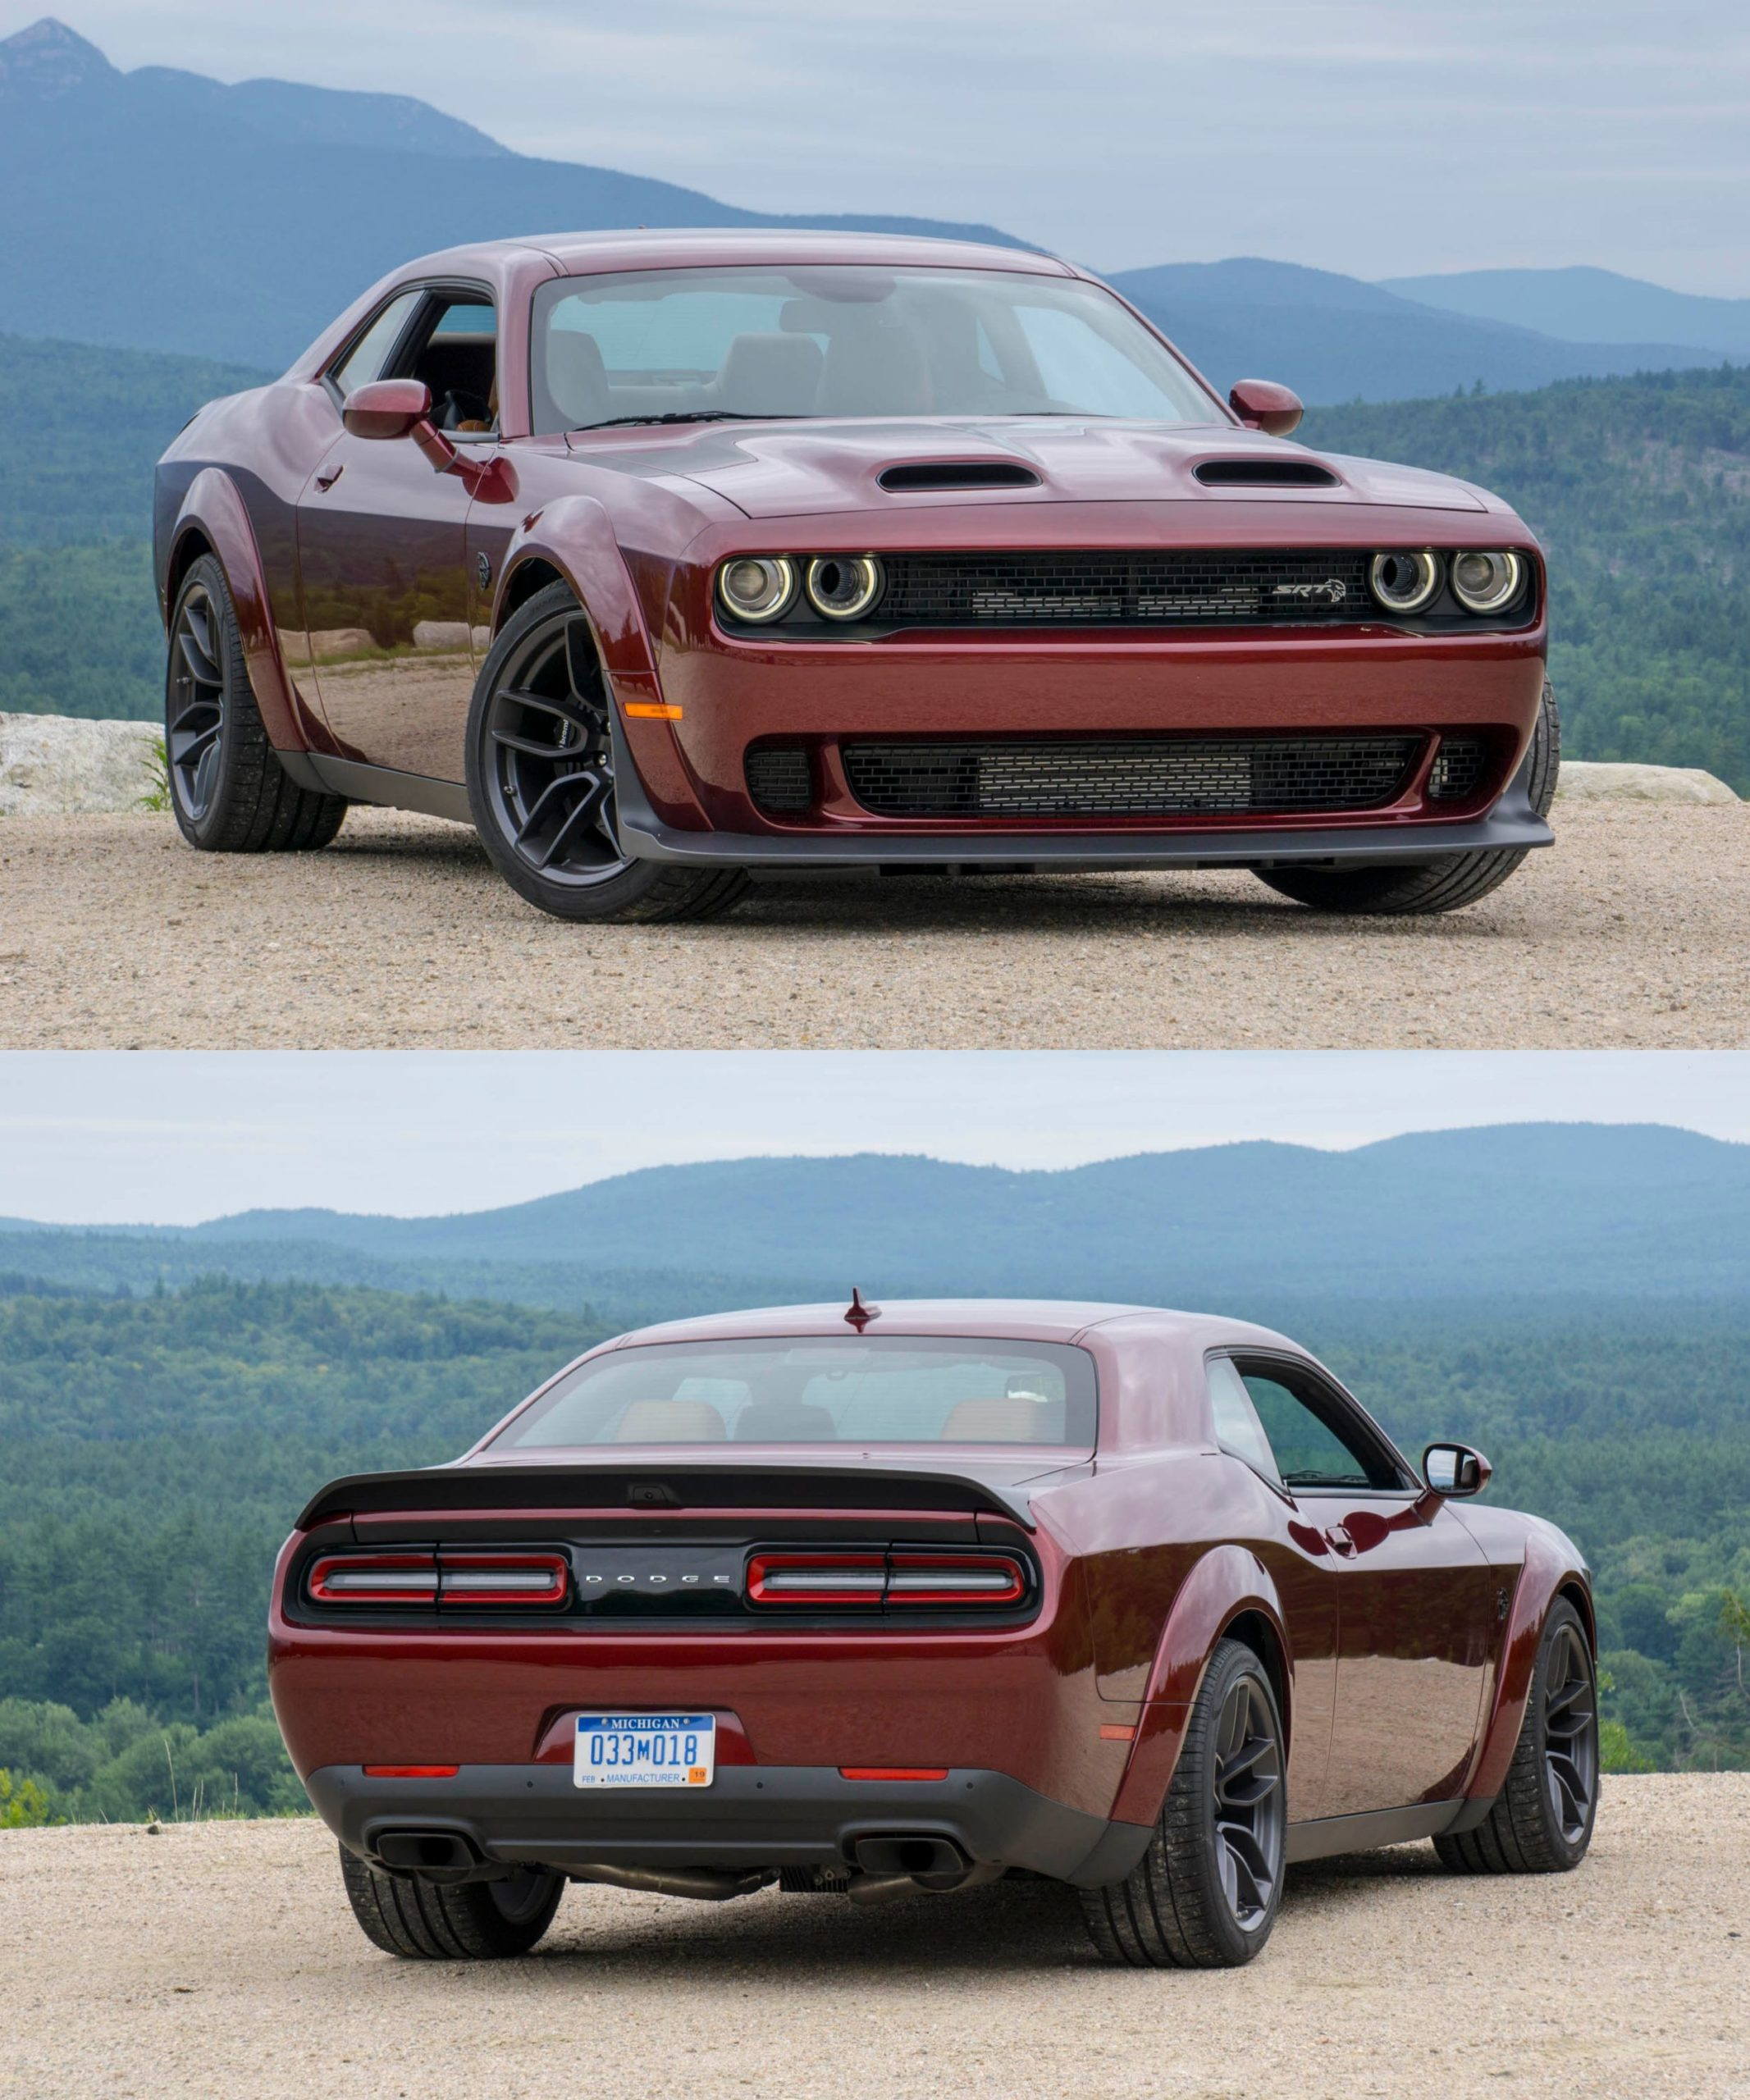 2019 Dodge Challenger Hellcat Redeye